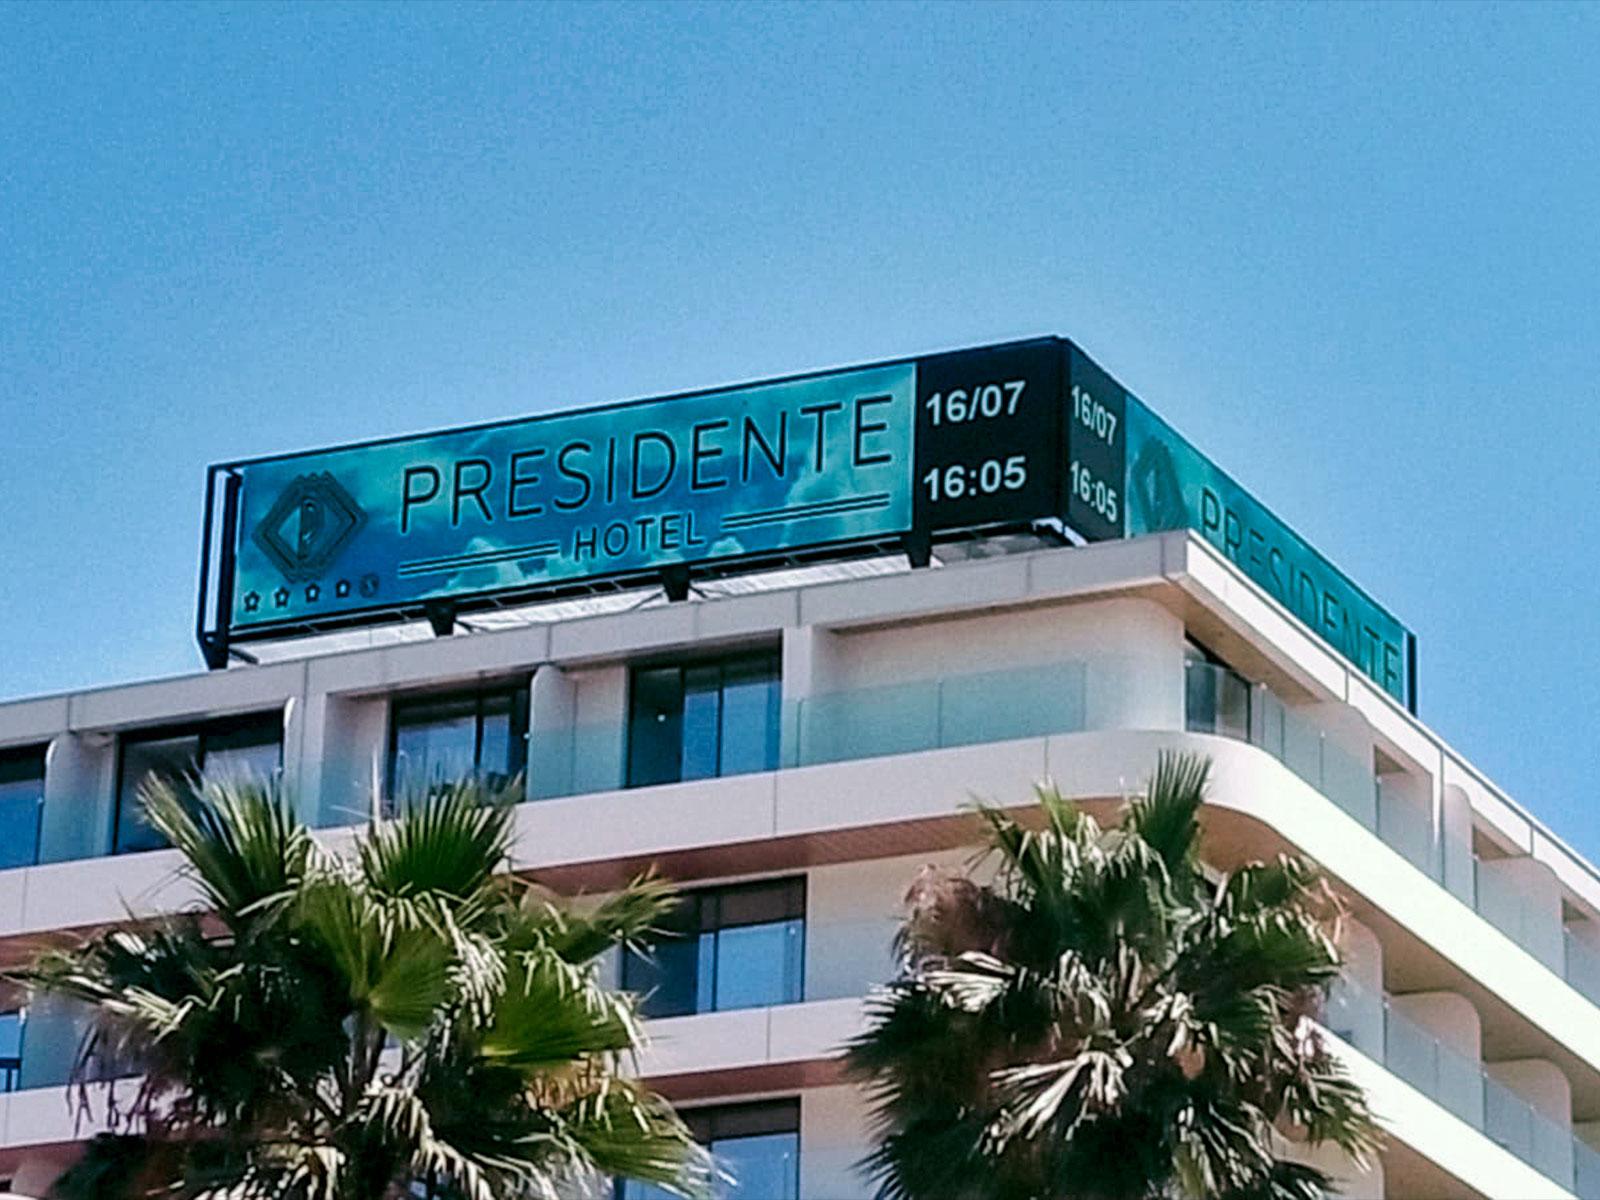 INST. Pantallas LED Hoteles Benidorm